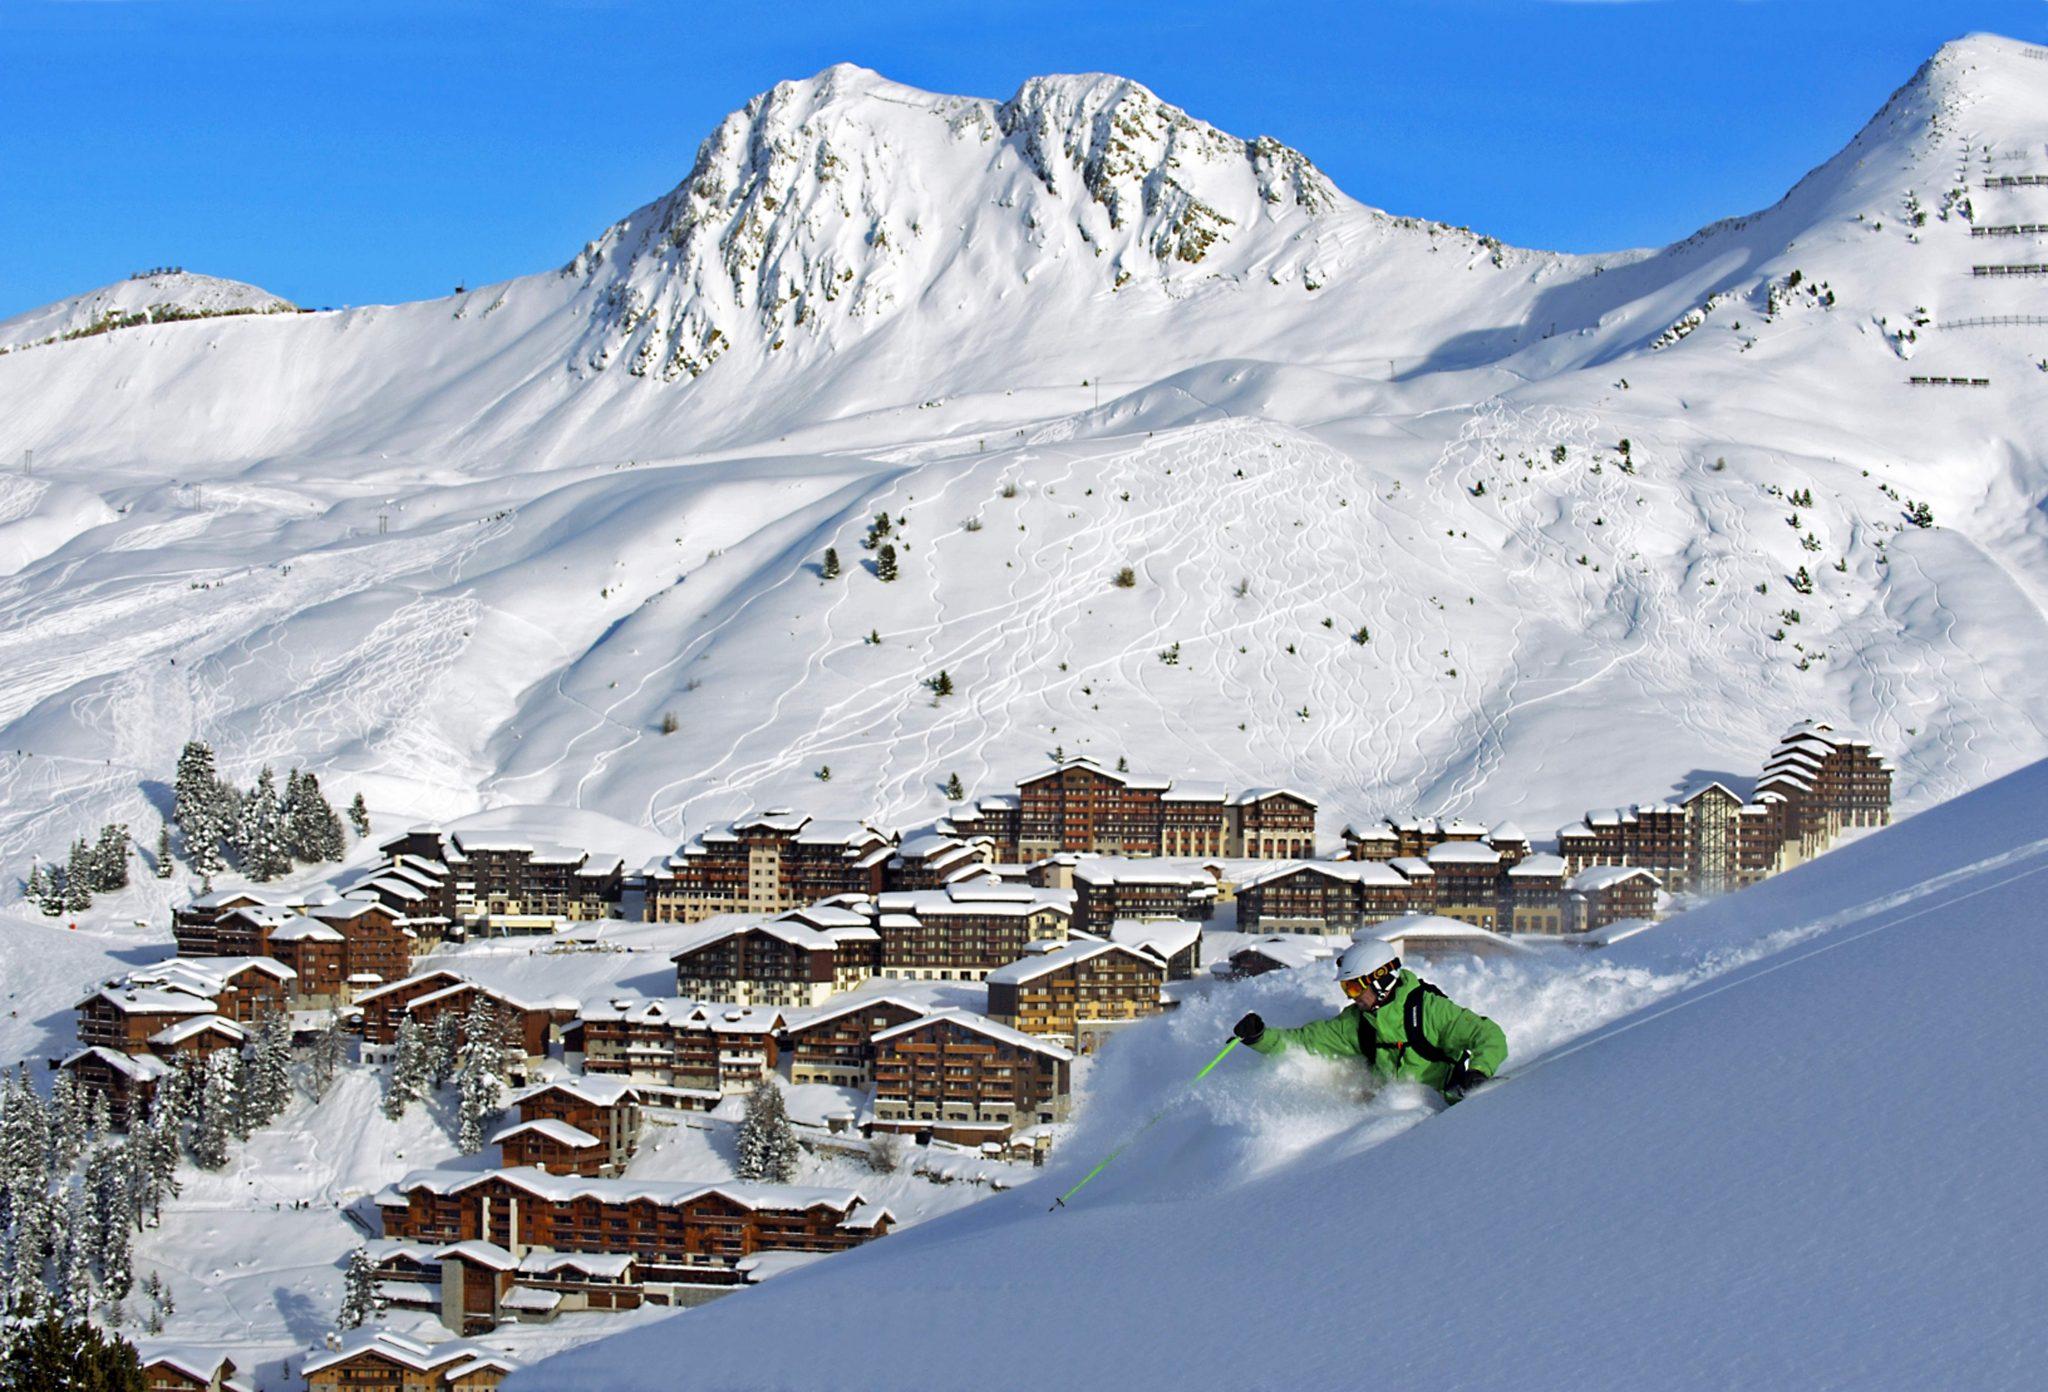 world's biggest ski resort operator increases revenue from lift